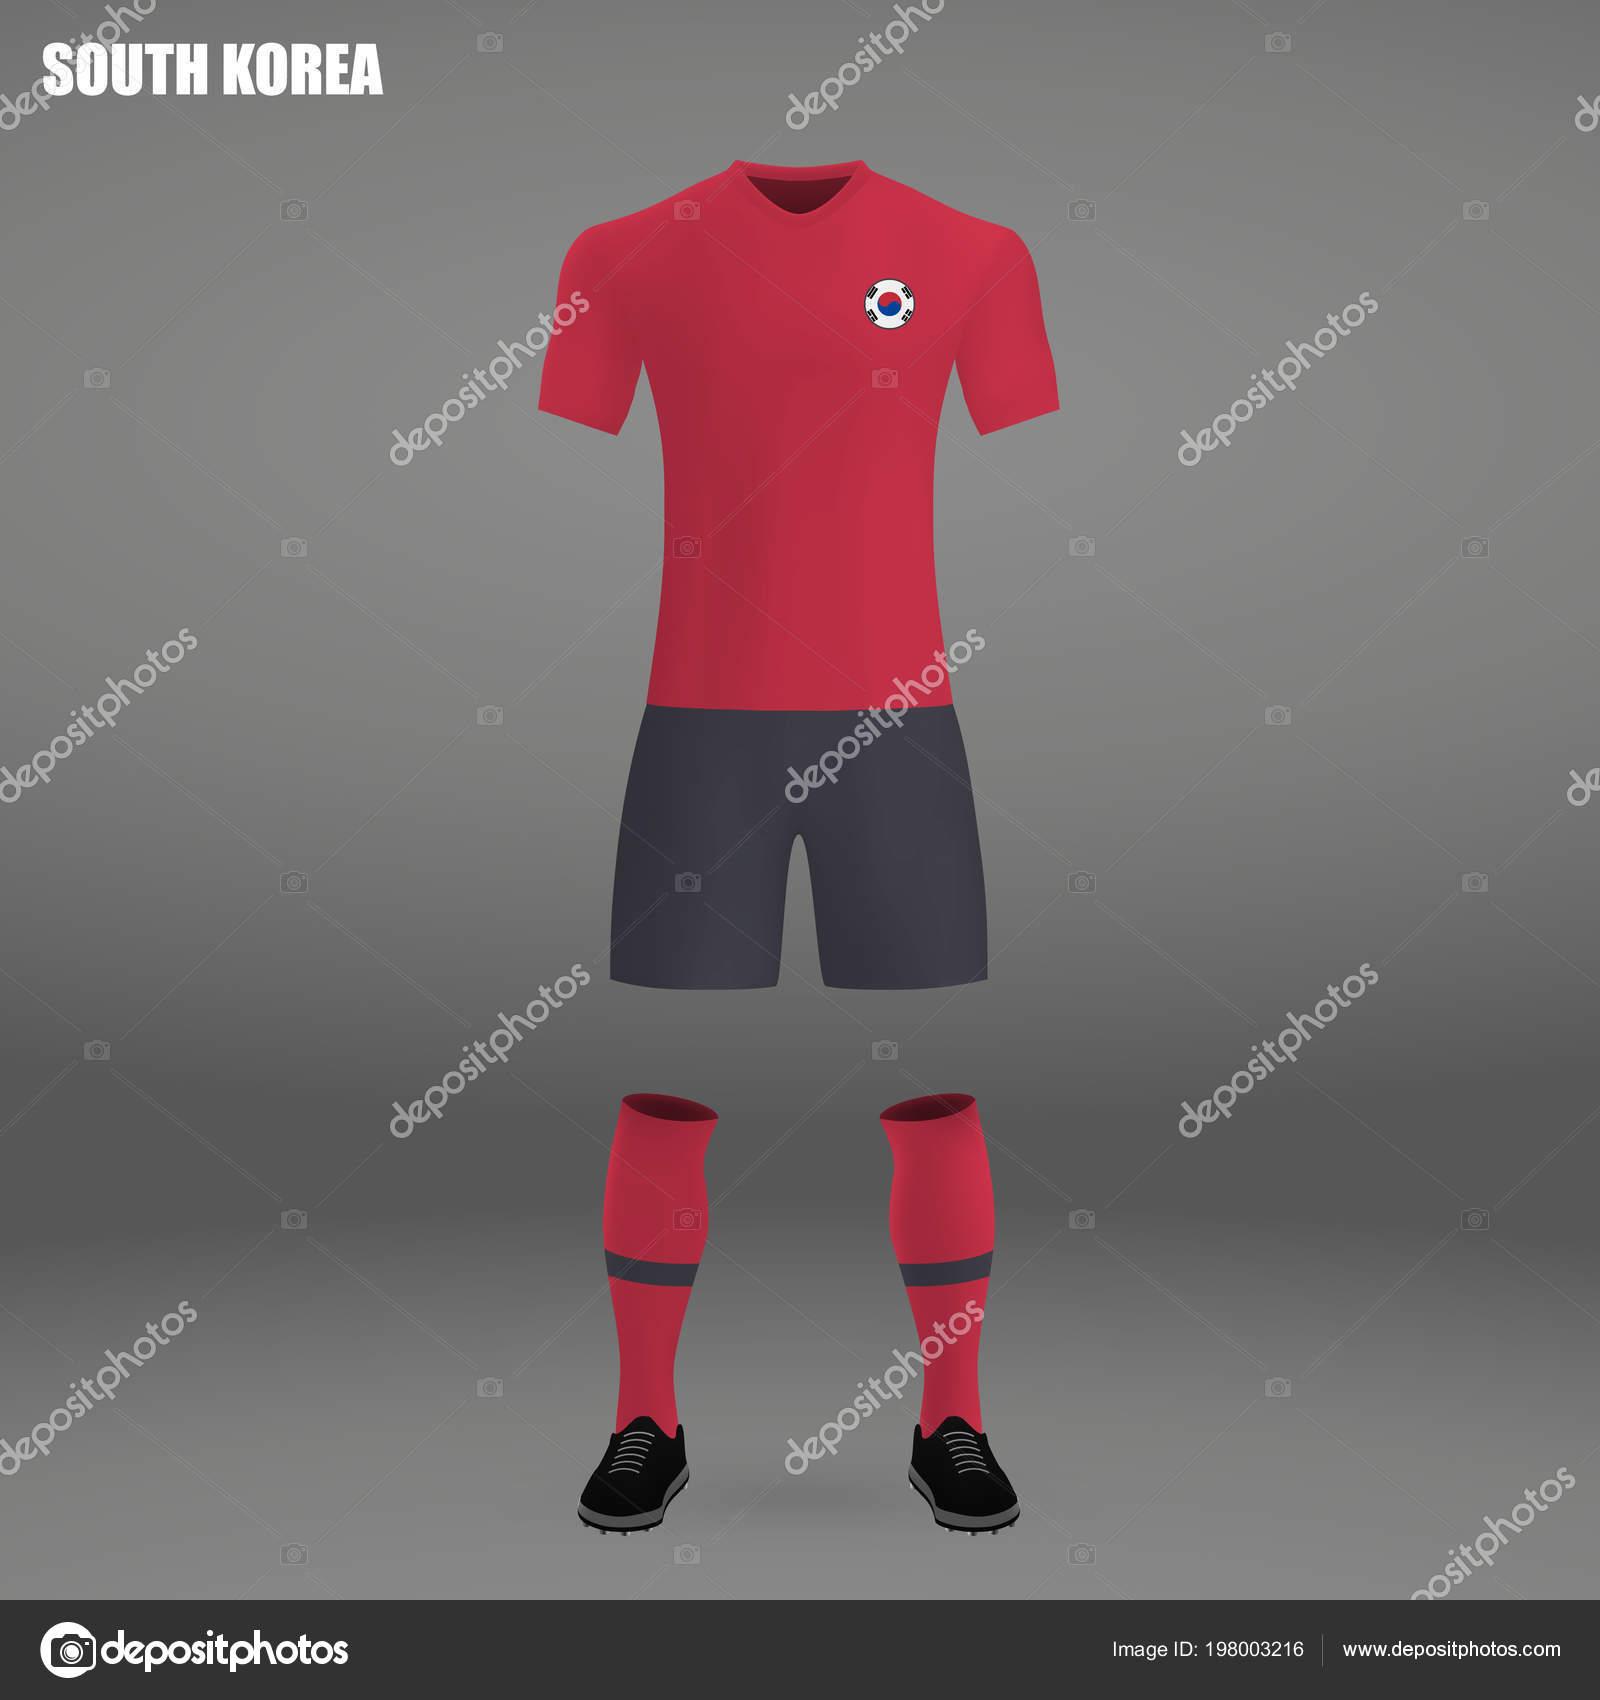 c5bb82f9d Football Kit South Korea 2018 Shirt Template Soccer Jersey Vector — Stock  Vector